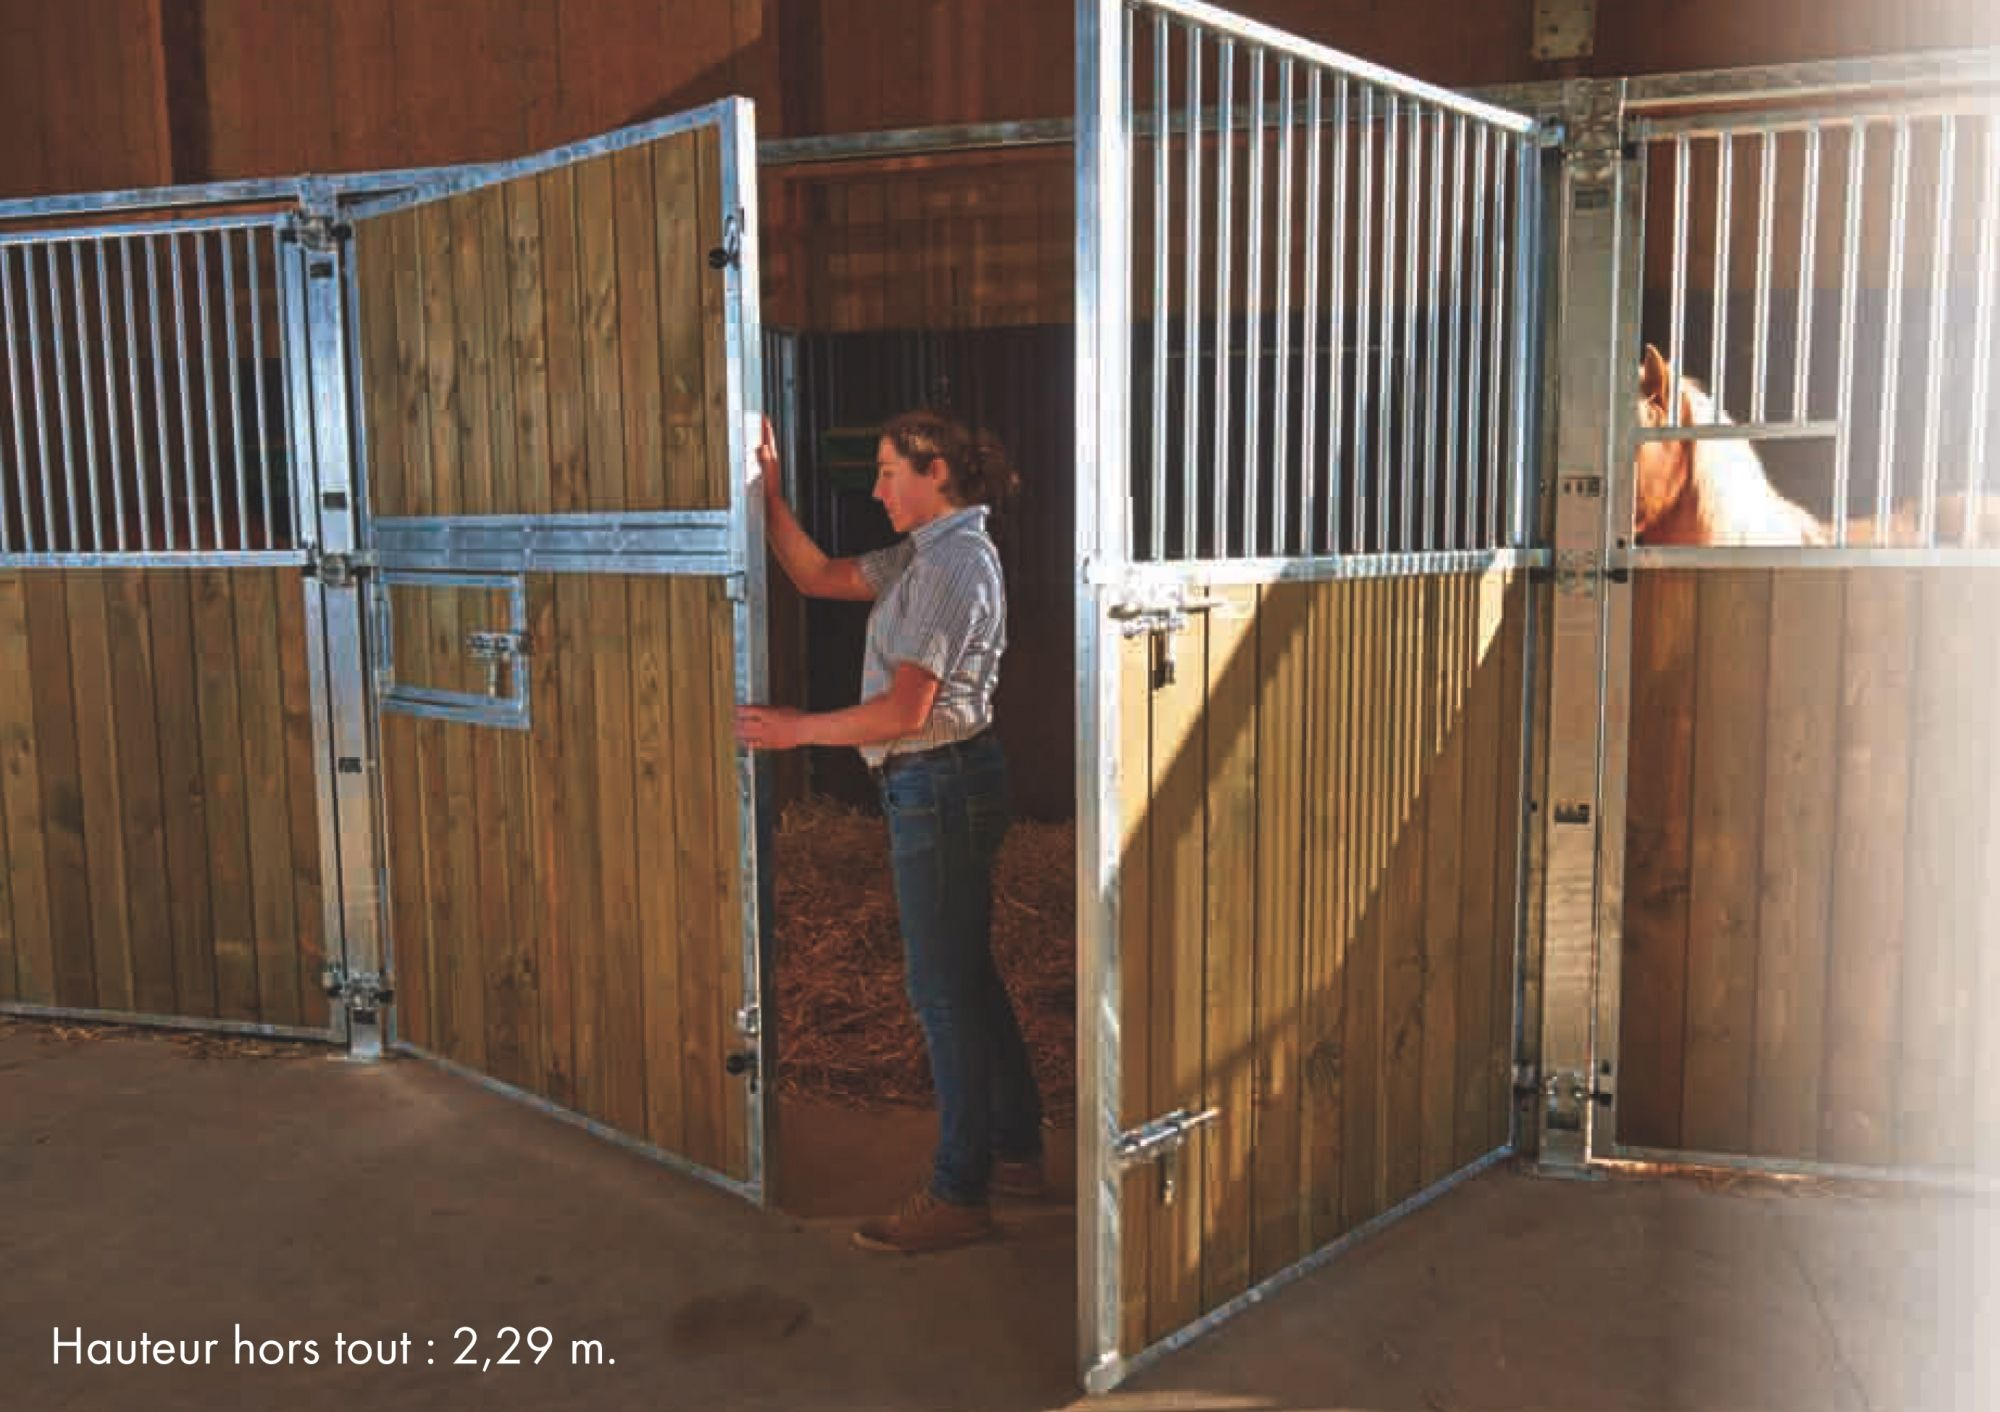 Fa ade de boxe ouvrante plein bois douglas - Porte de box pour chevaux a vendre ...